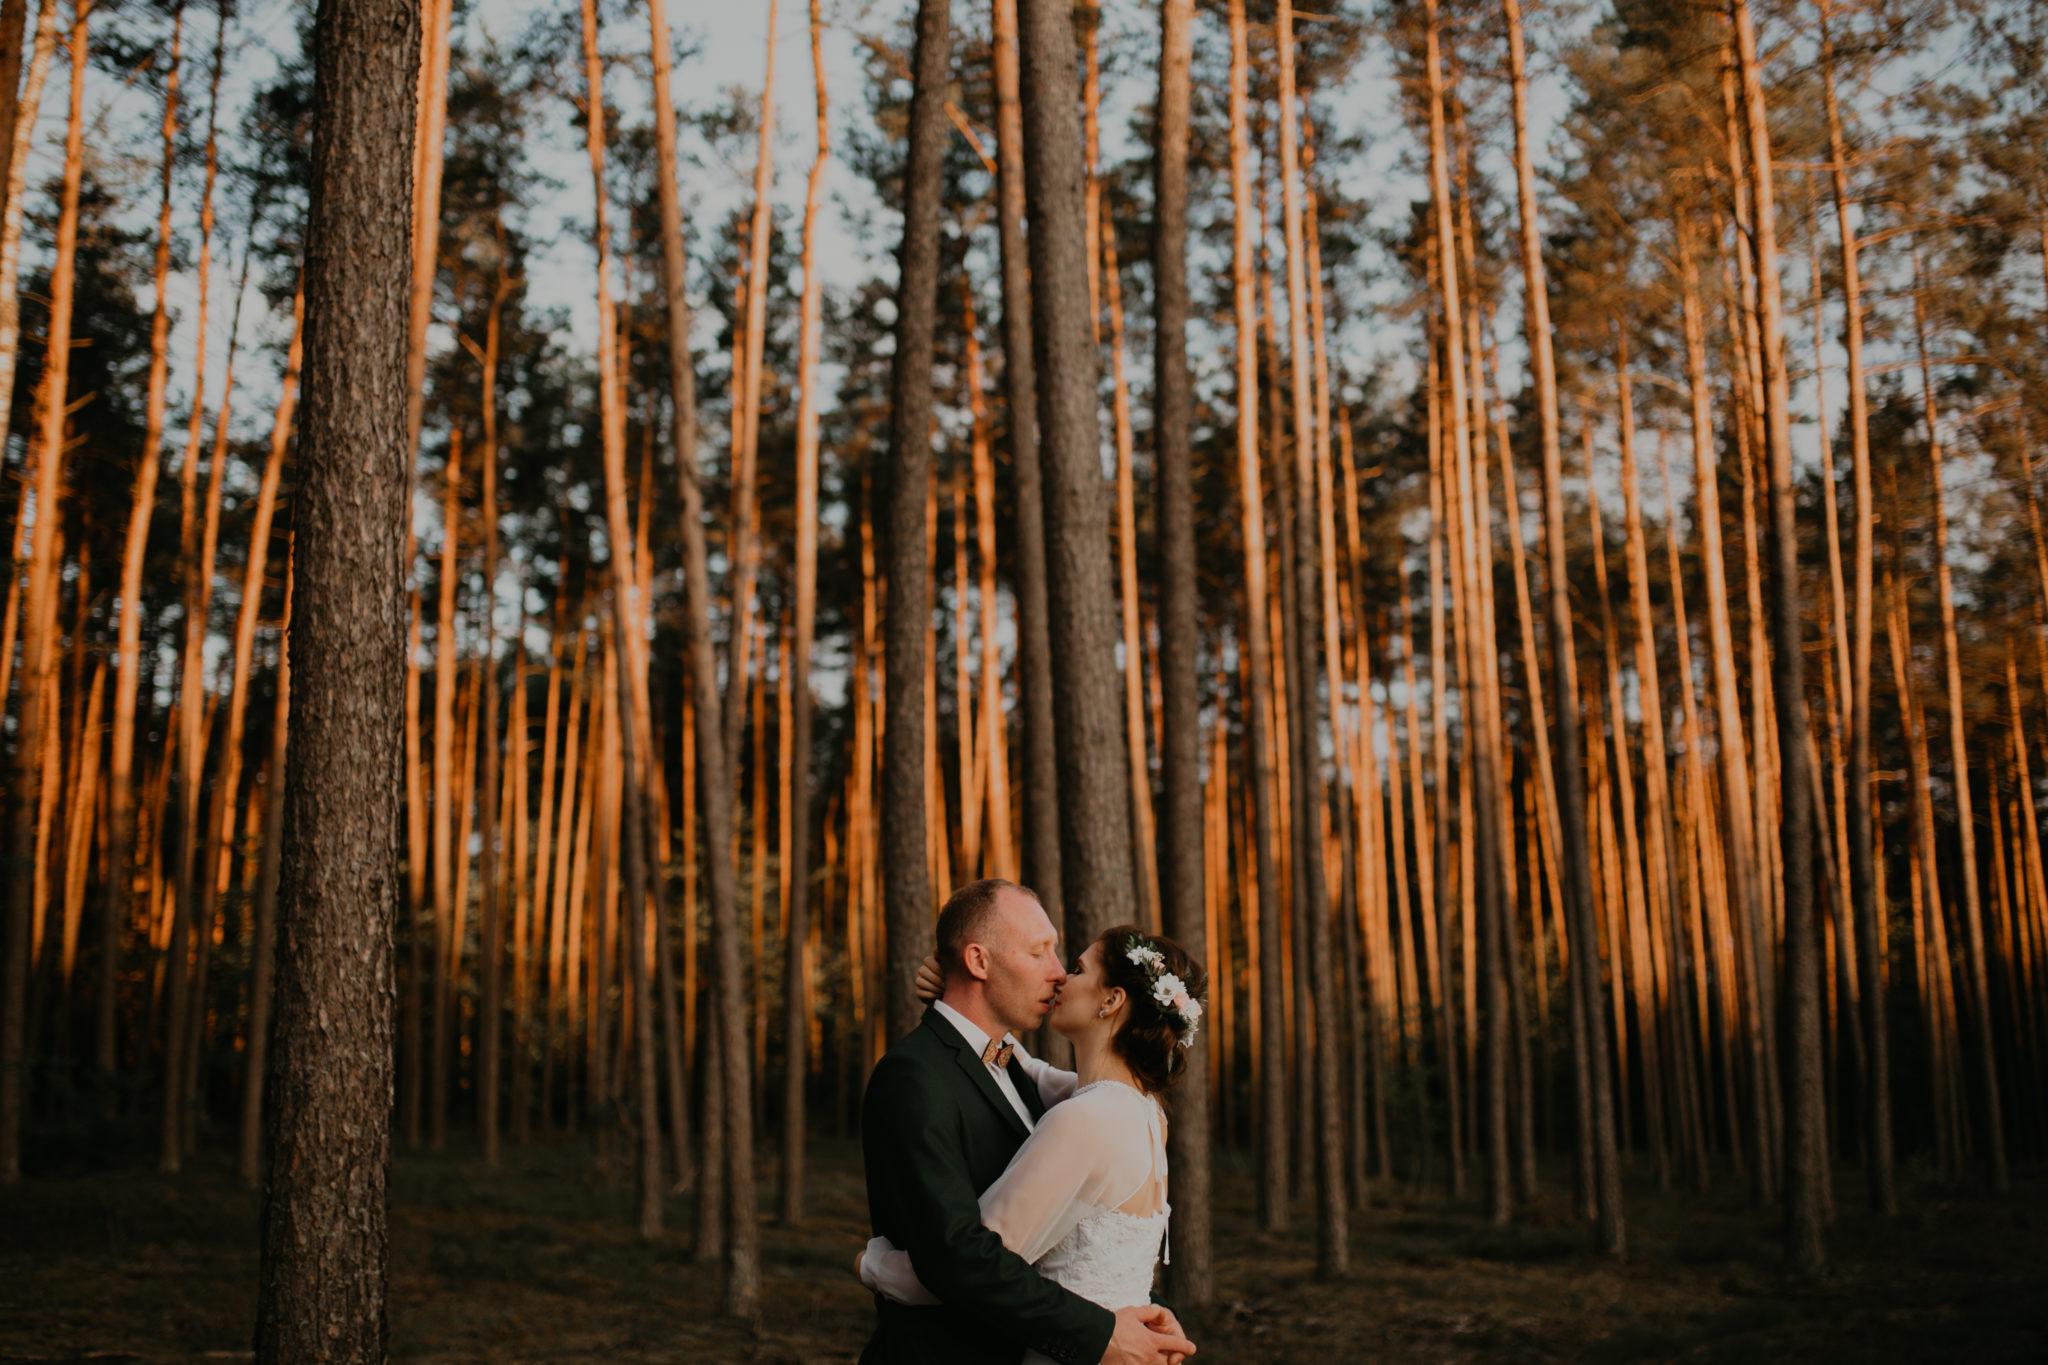 gosia i kubaplener 18 1 - fotografiagk Fotografia ślubna RK wedding